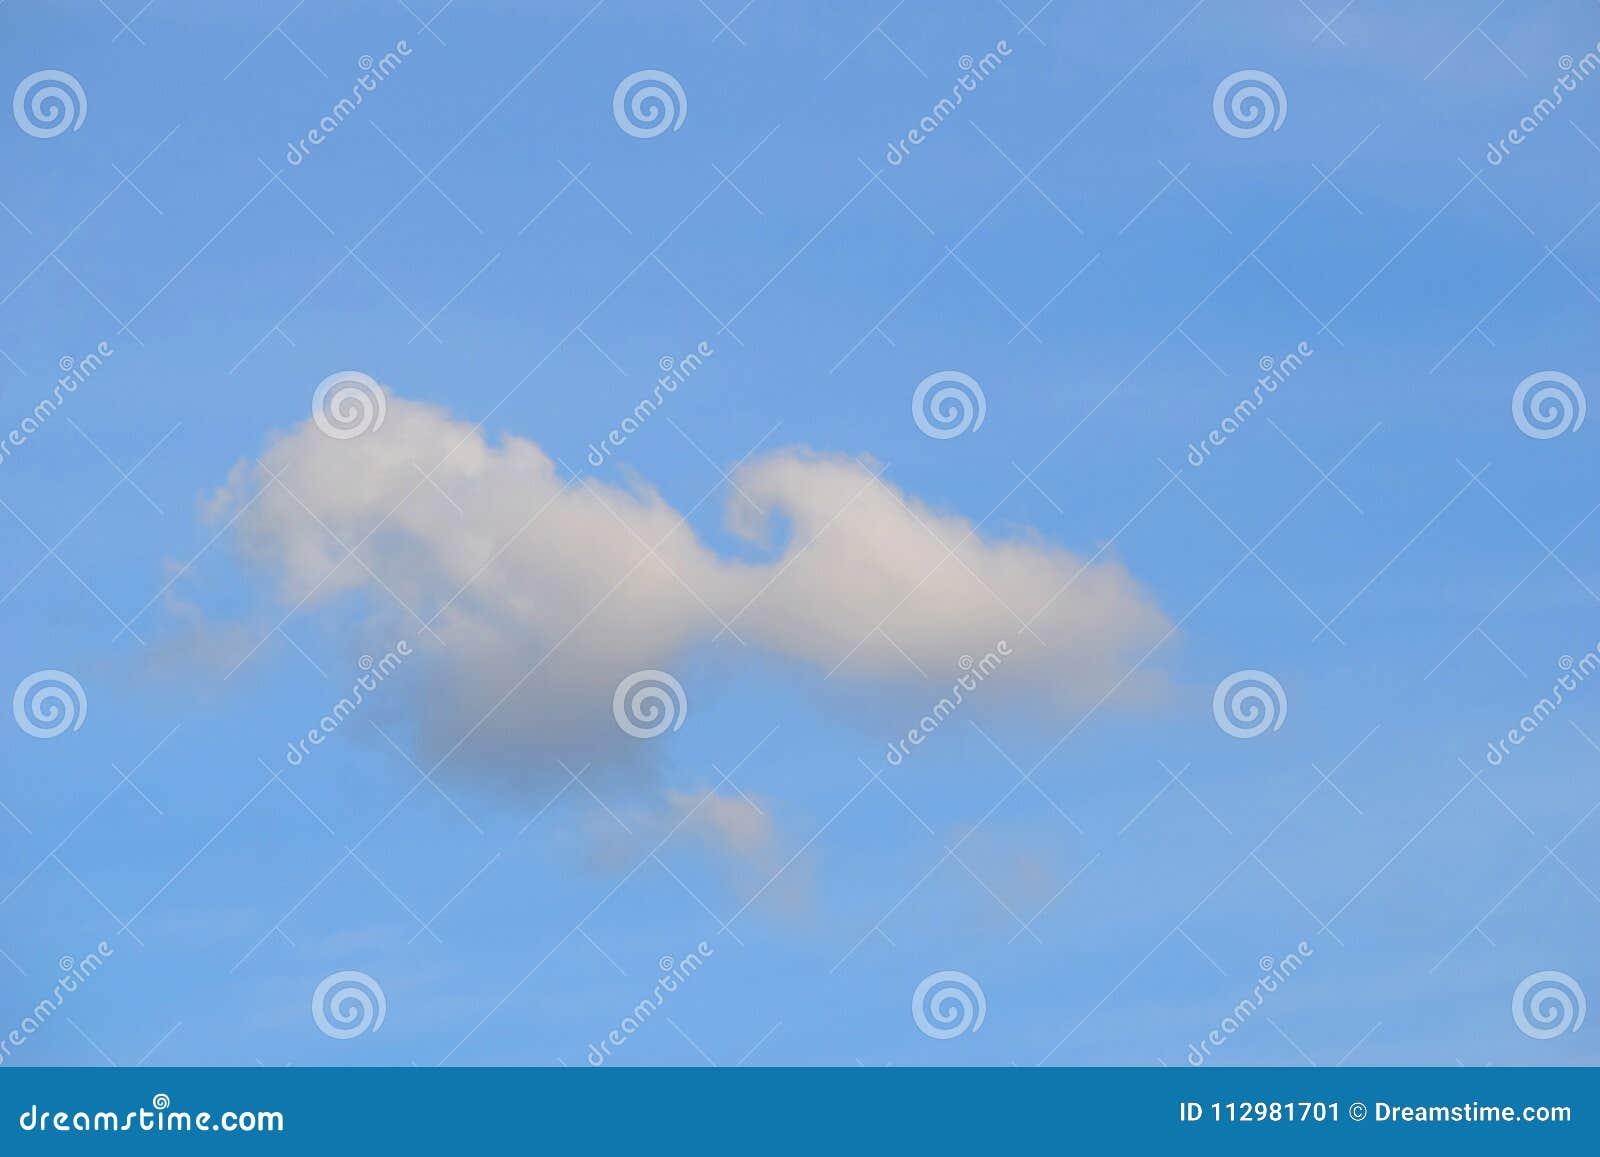 Funny cloud in a blue sky